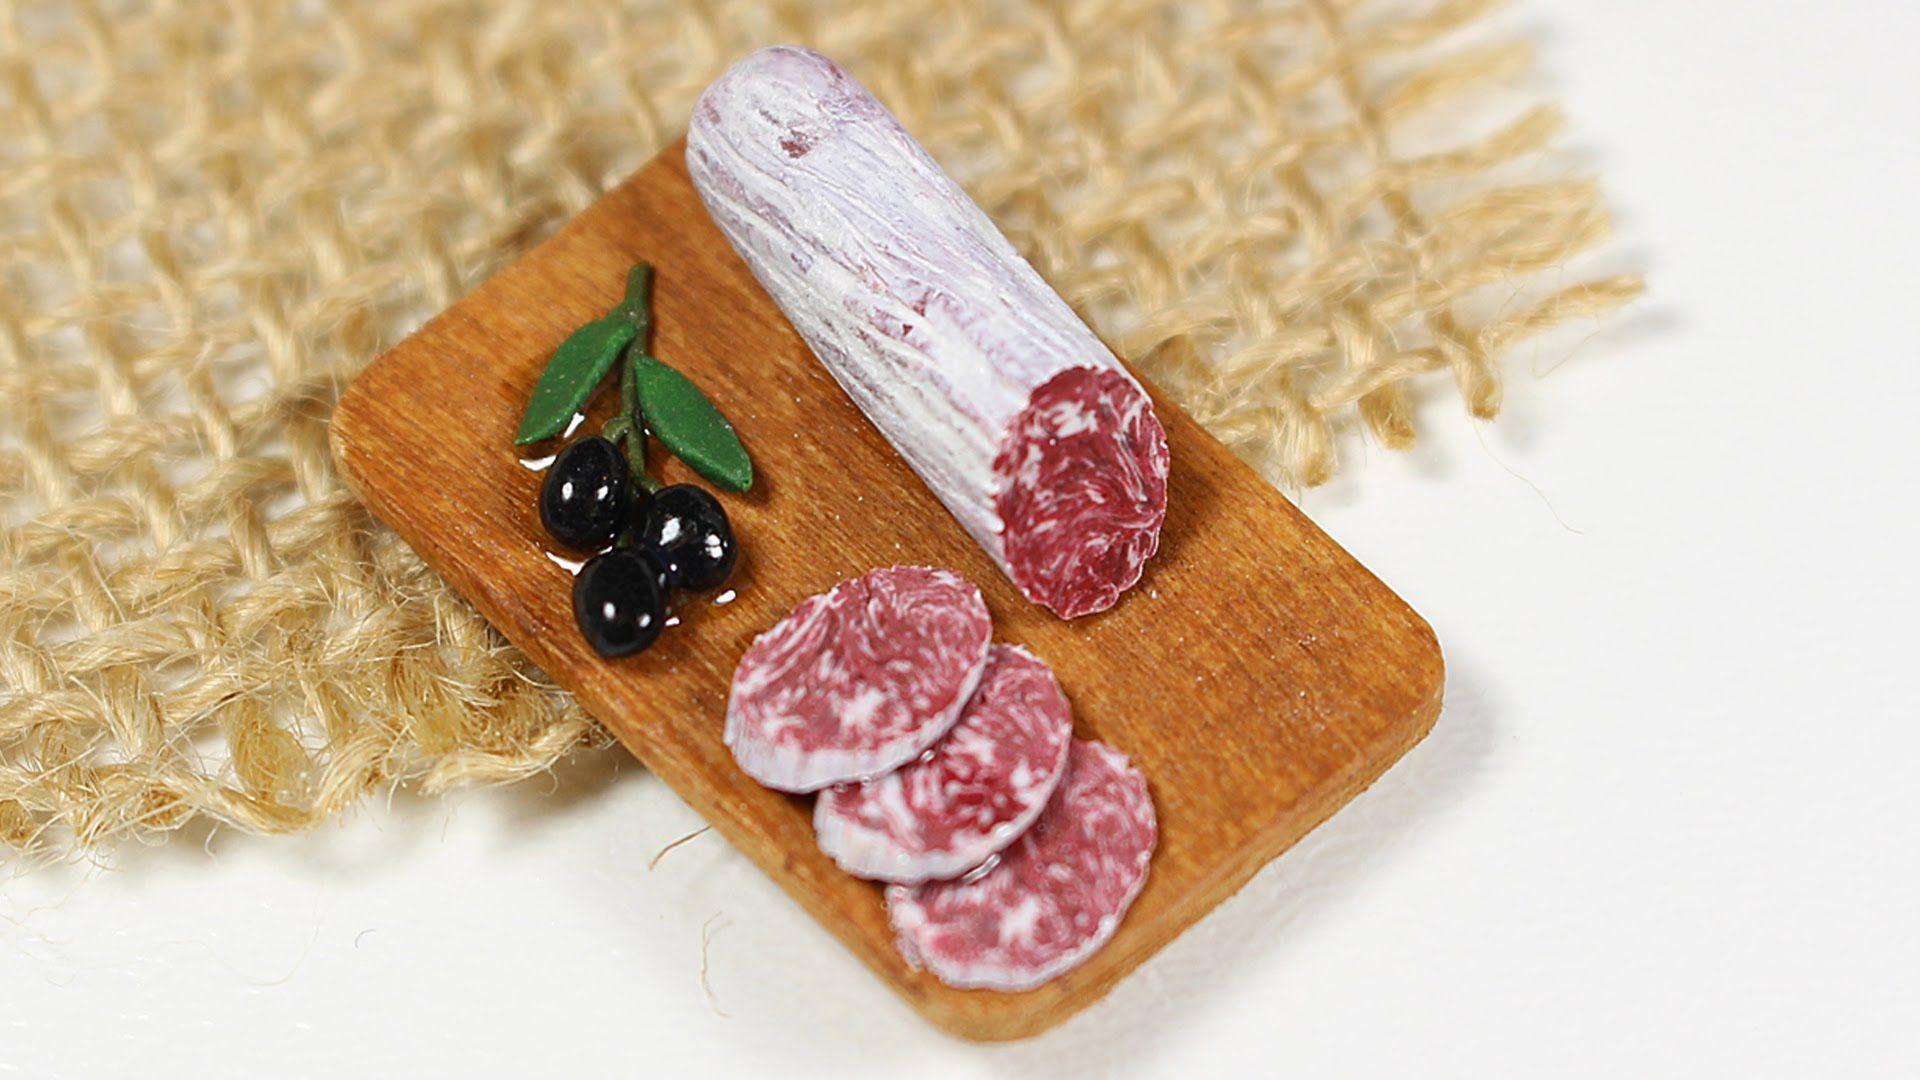 miniature salami on board TUTORIAL (polymer clay)